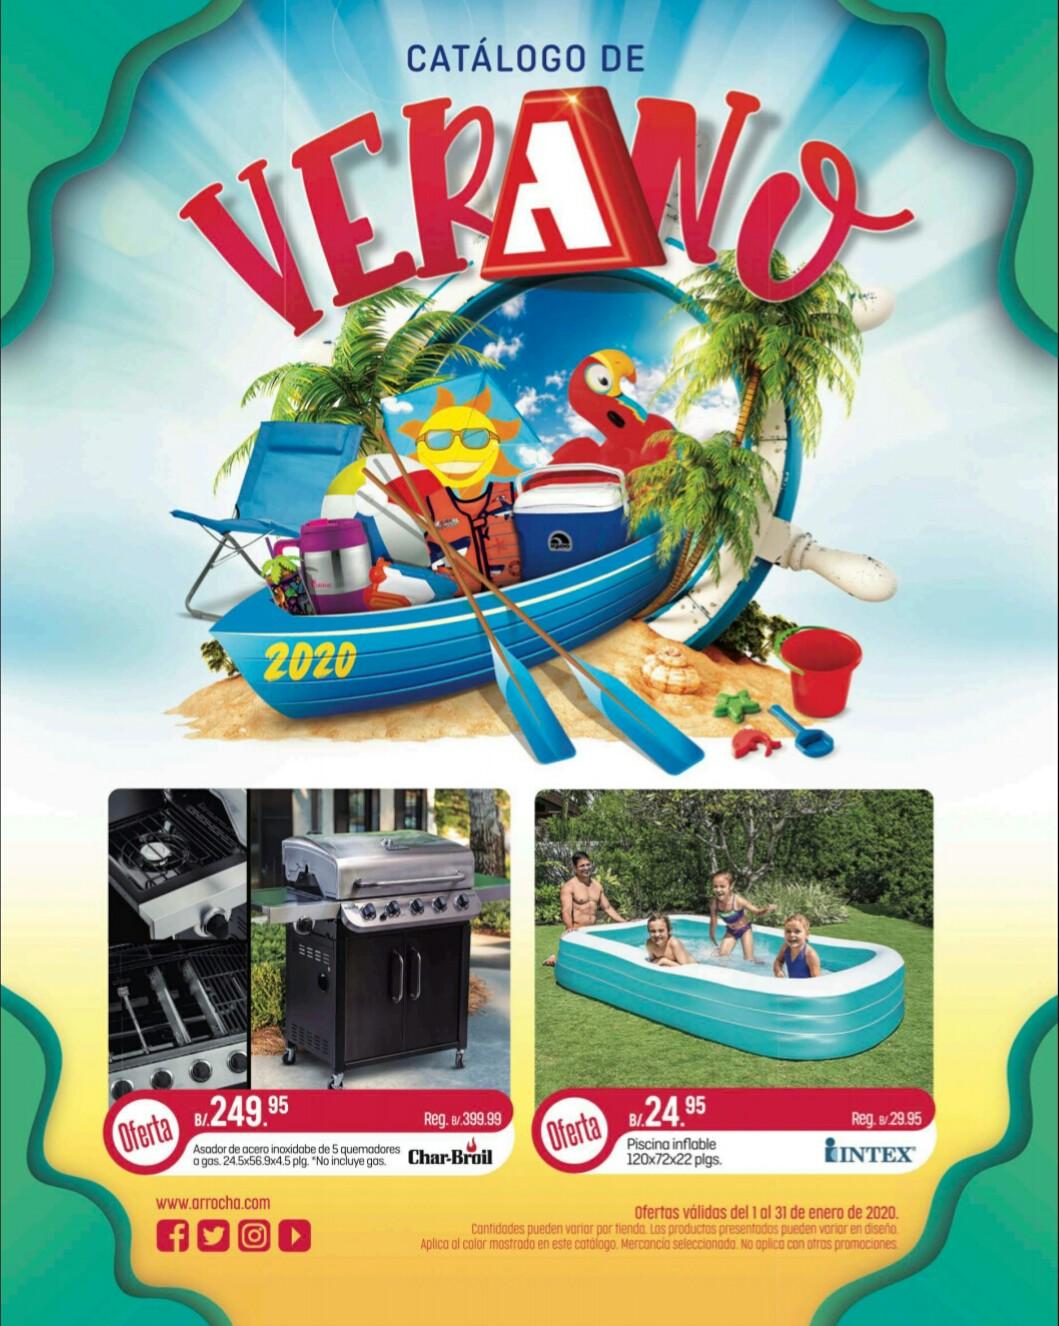 Catalogo Arrocha Verano 2020 p1